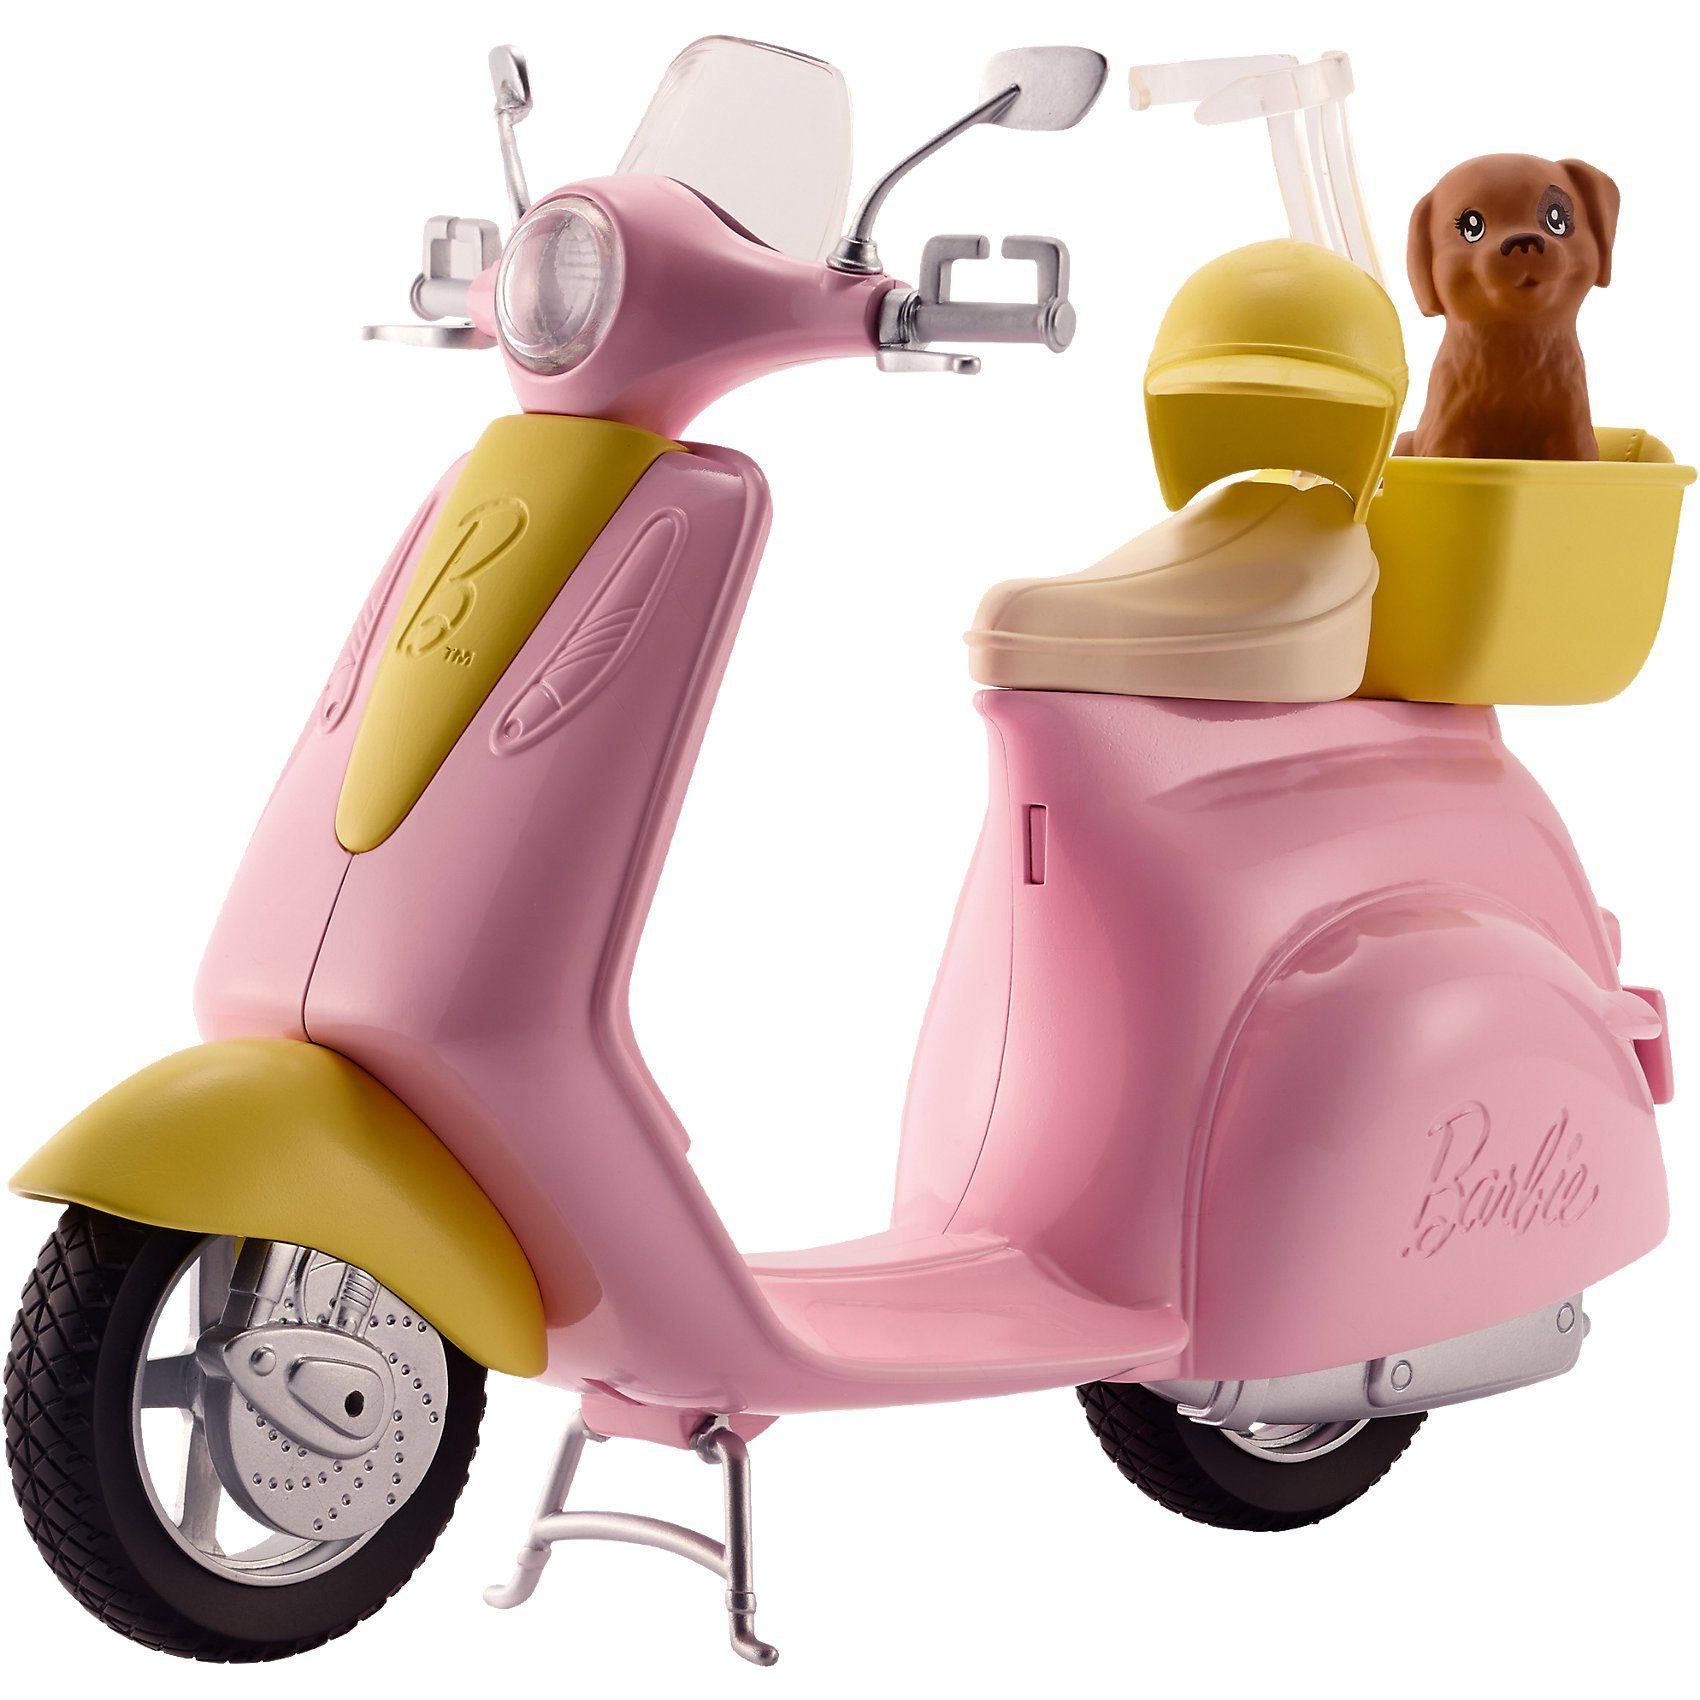 Mattel® Barbie Roller